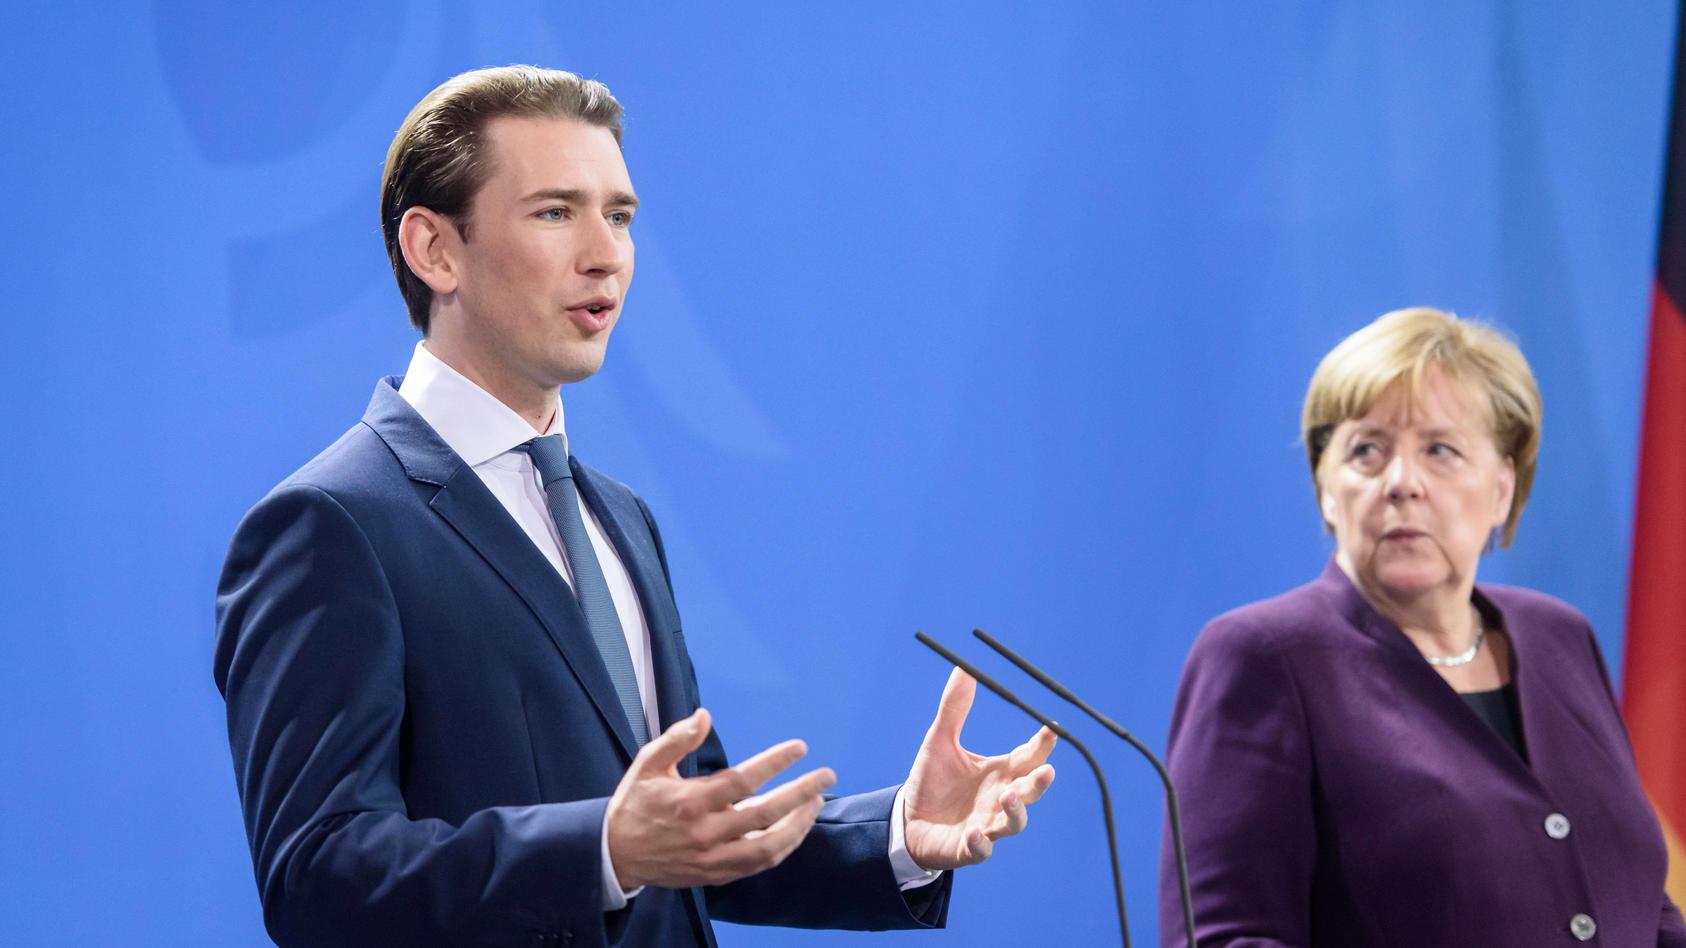 Berlin, Angela Merkel trifft Sebastian Kurz